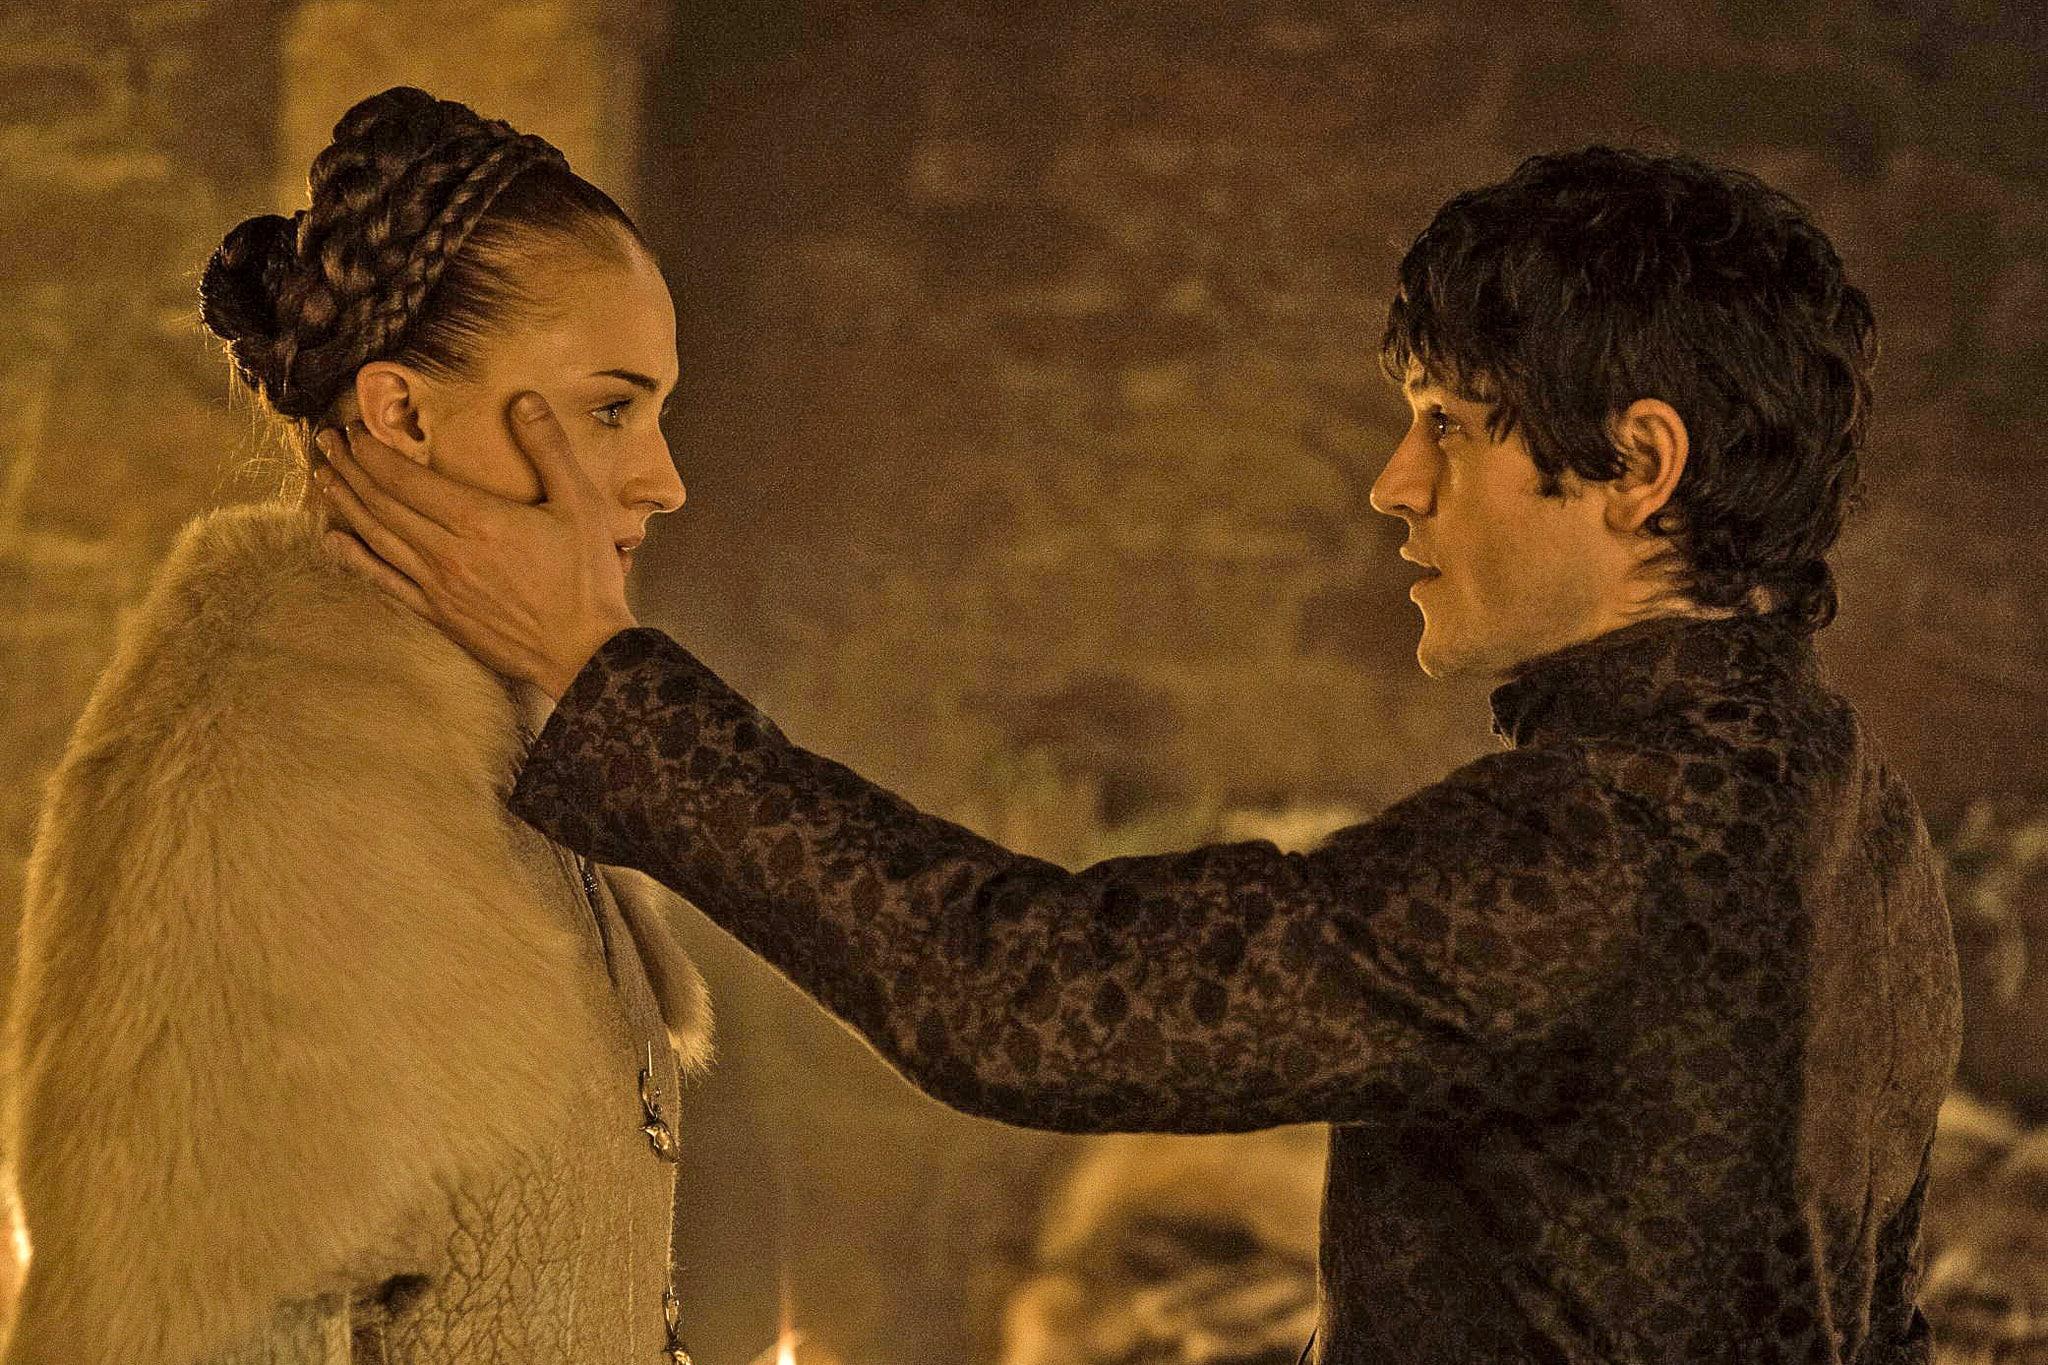 Sansa Starks rape by Ramsay